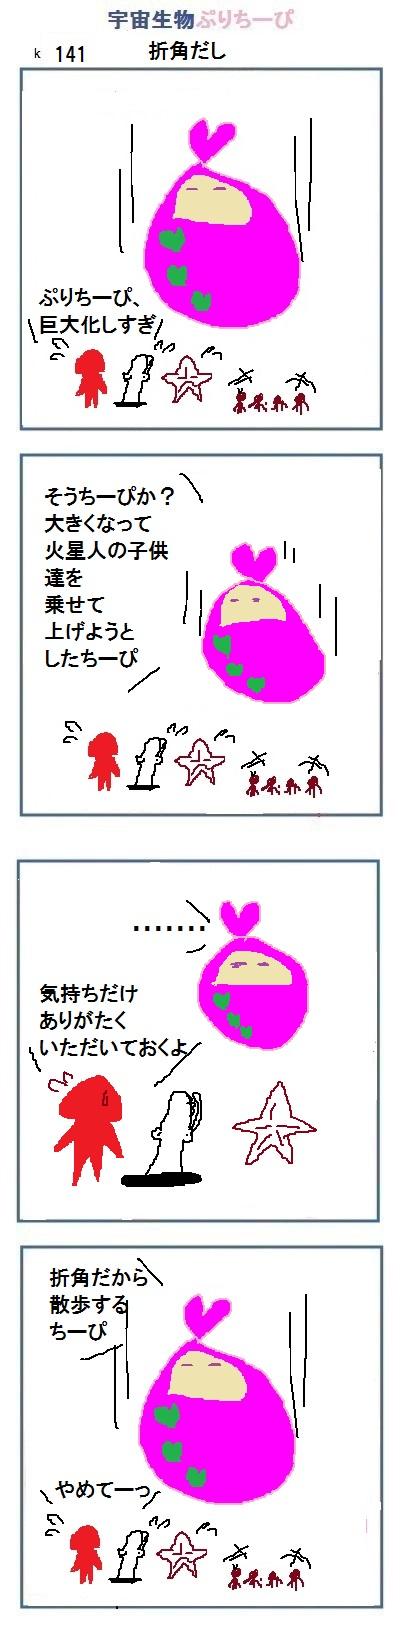 161024_k141.jpg